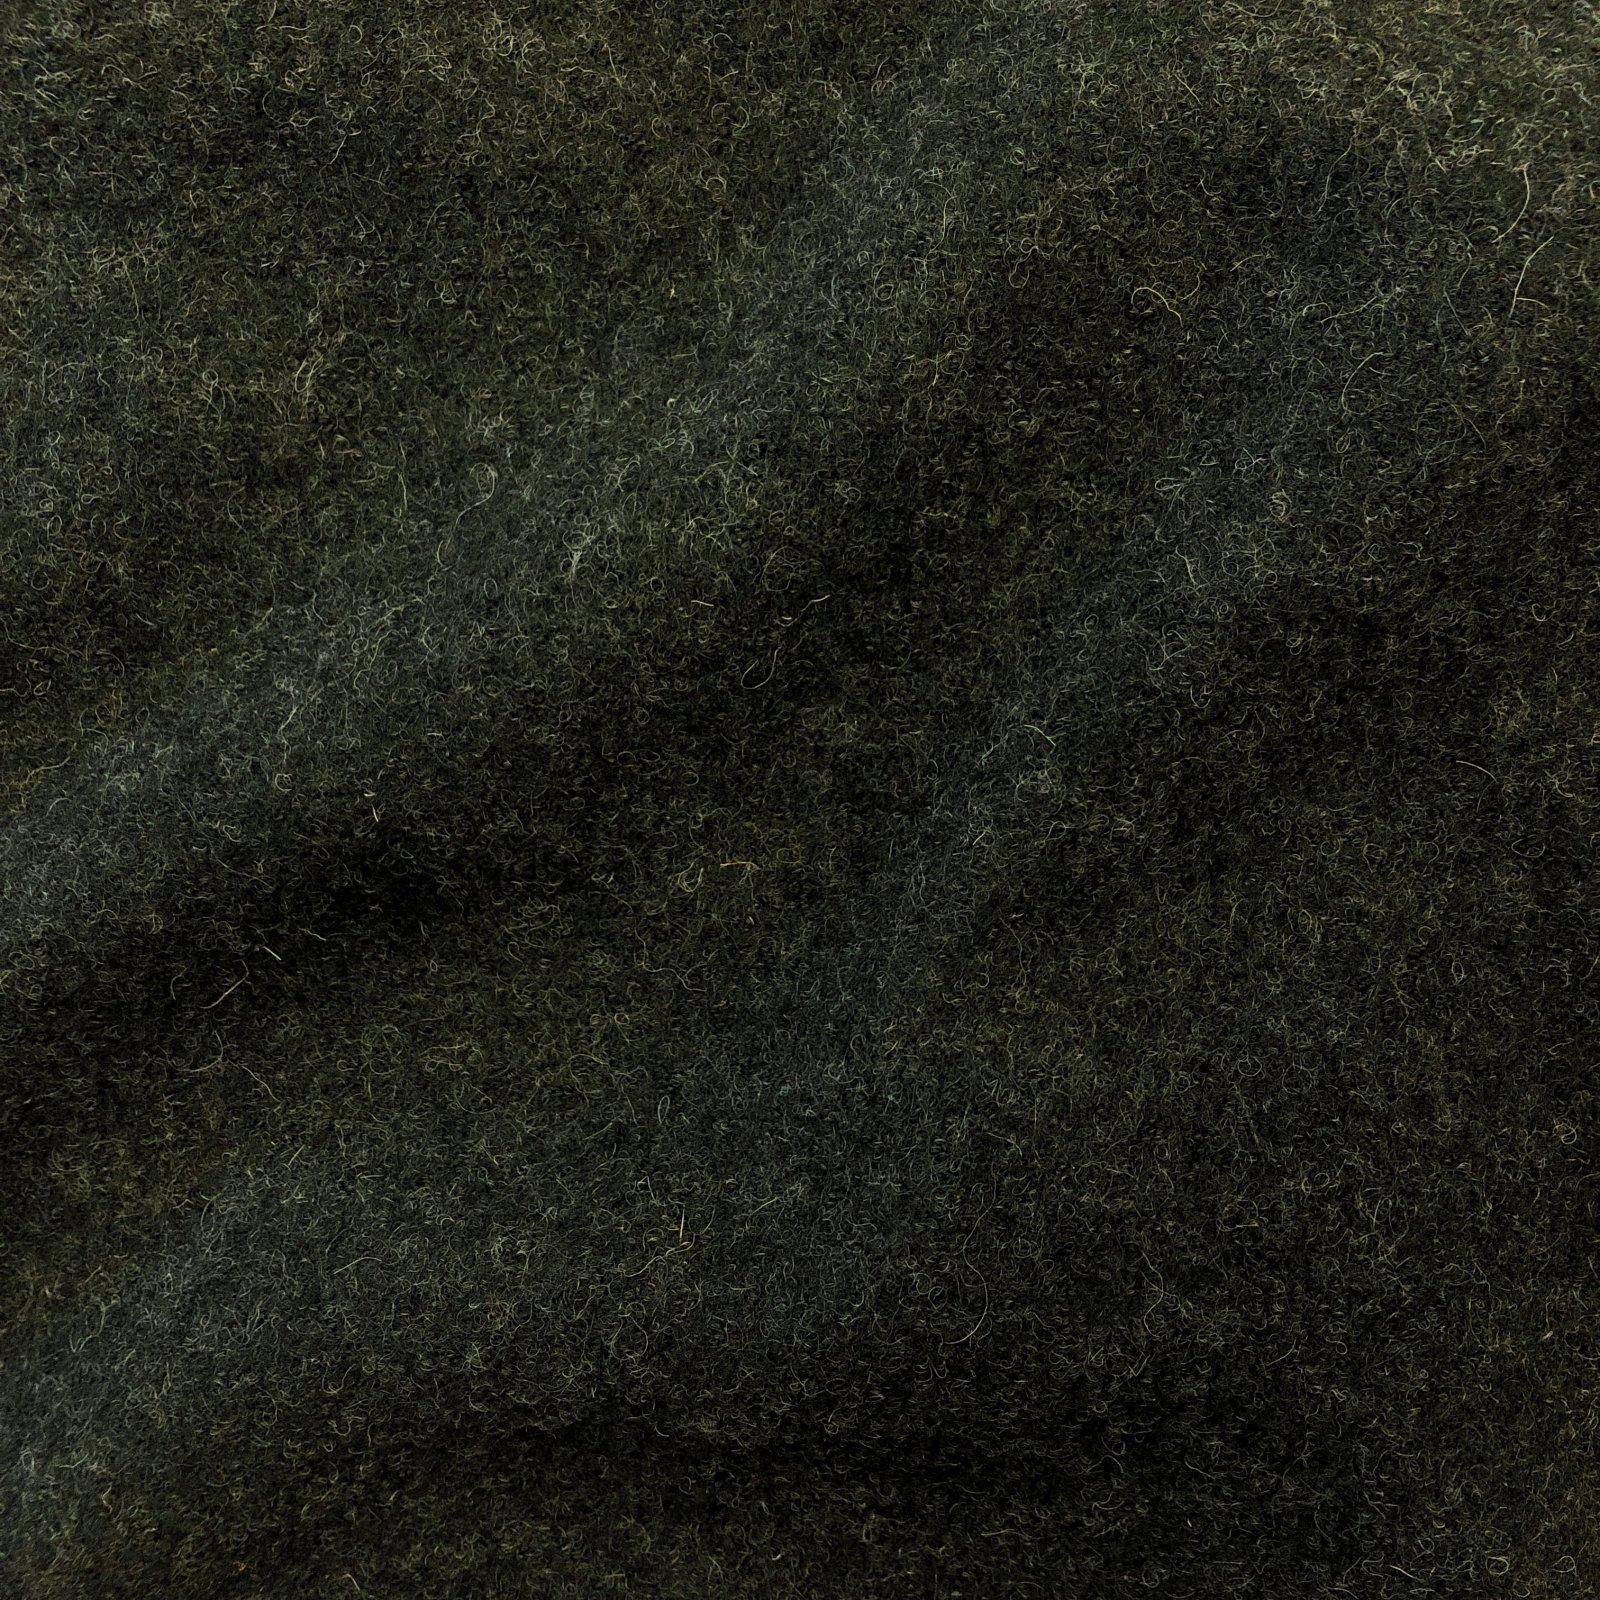 Boiled Wool - Loden